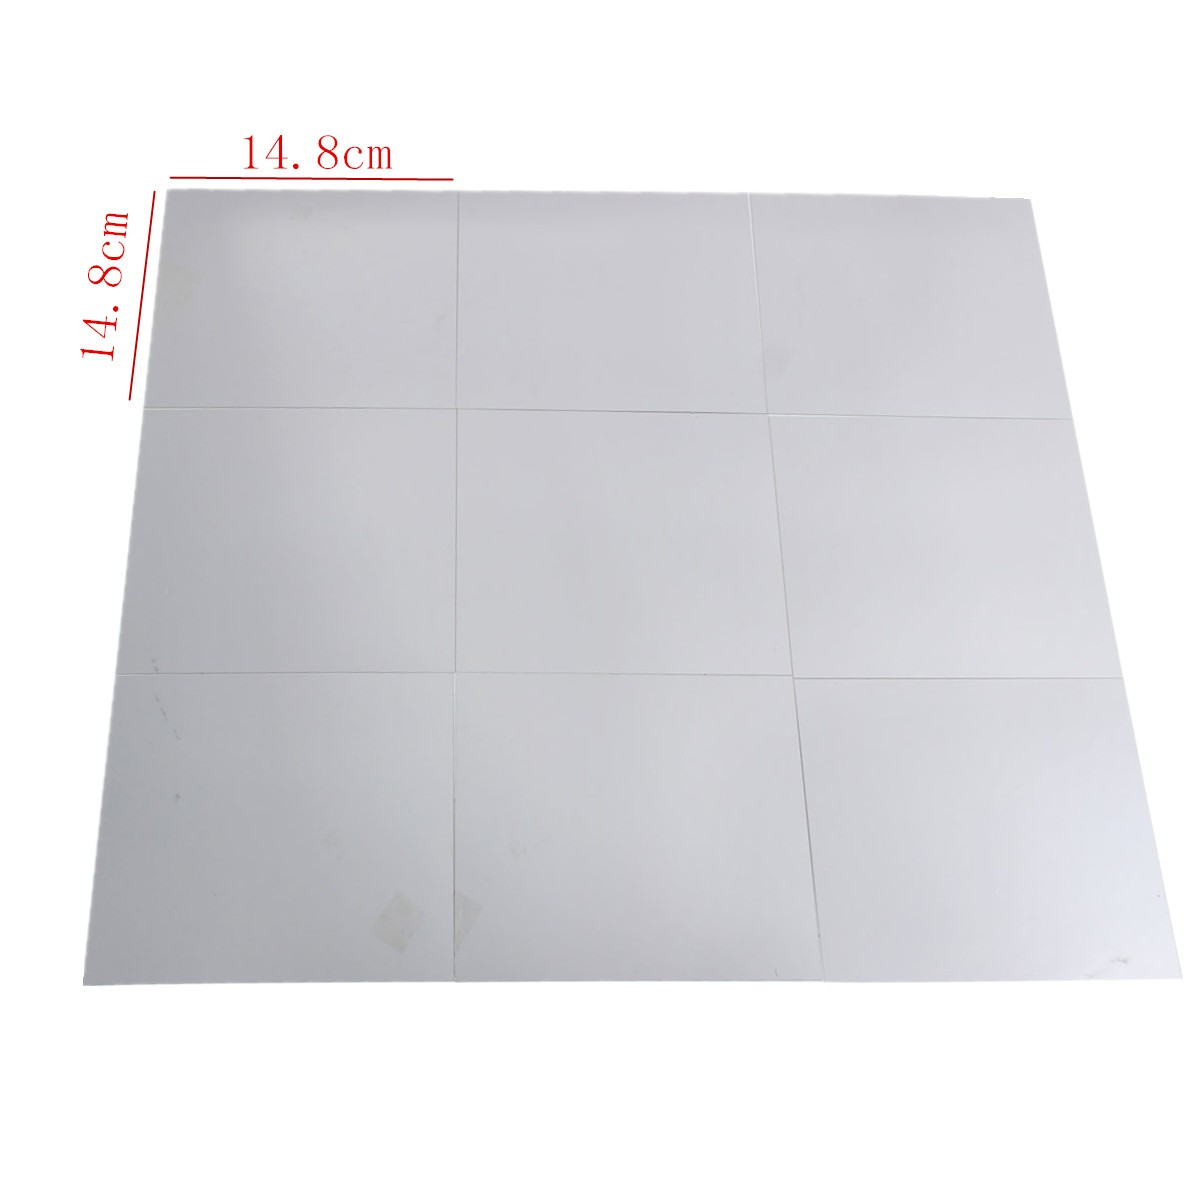 9Pcs 15×15cm Mirror Sheets Square Non Glass Mirrors Tiles Self Adhesive Mirror Wall Sticker